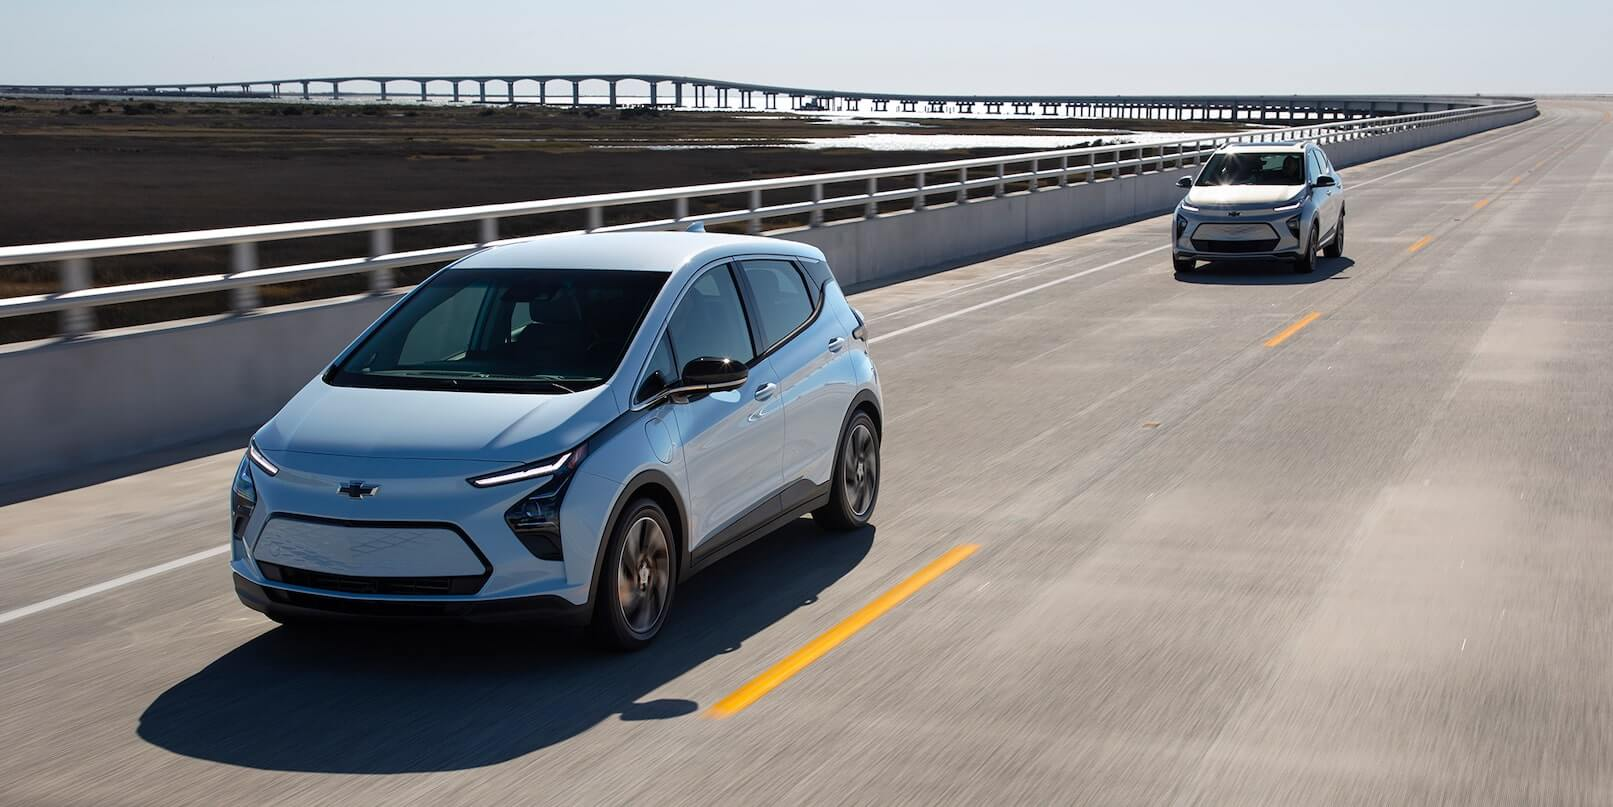 2022 Chevrolet Bolt EV driving on a high-way.